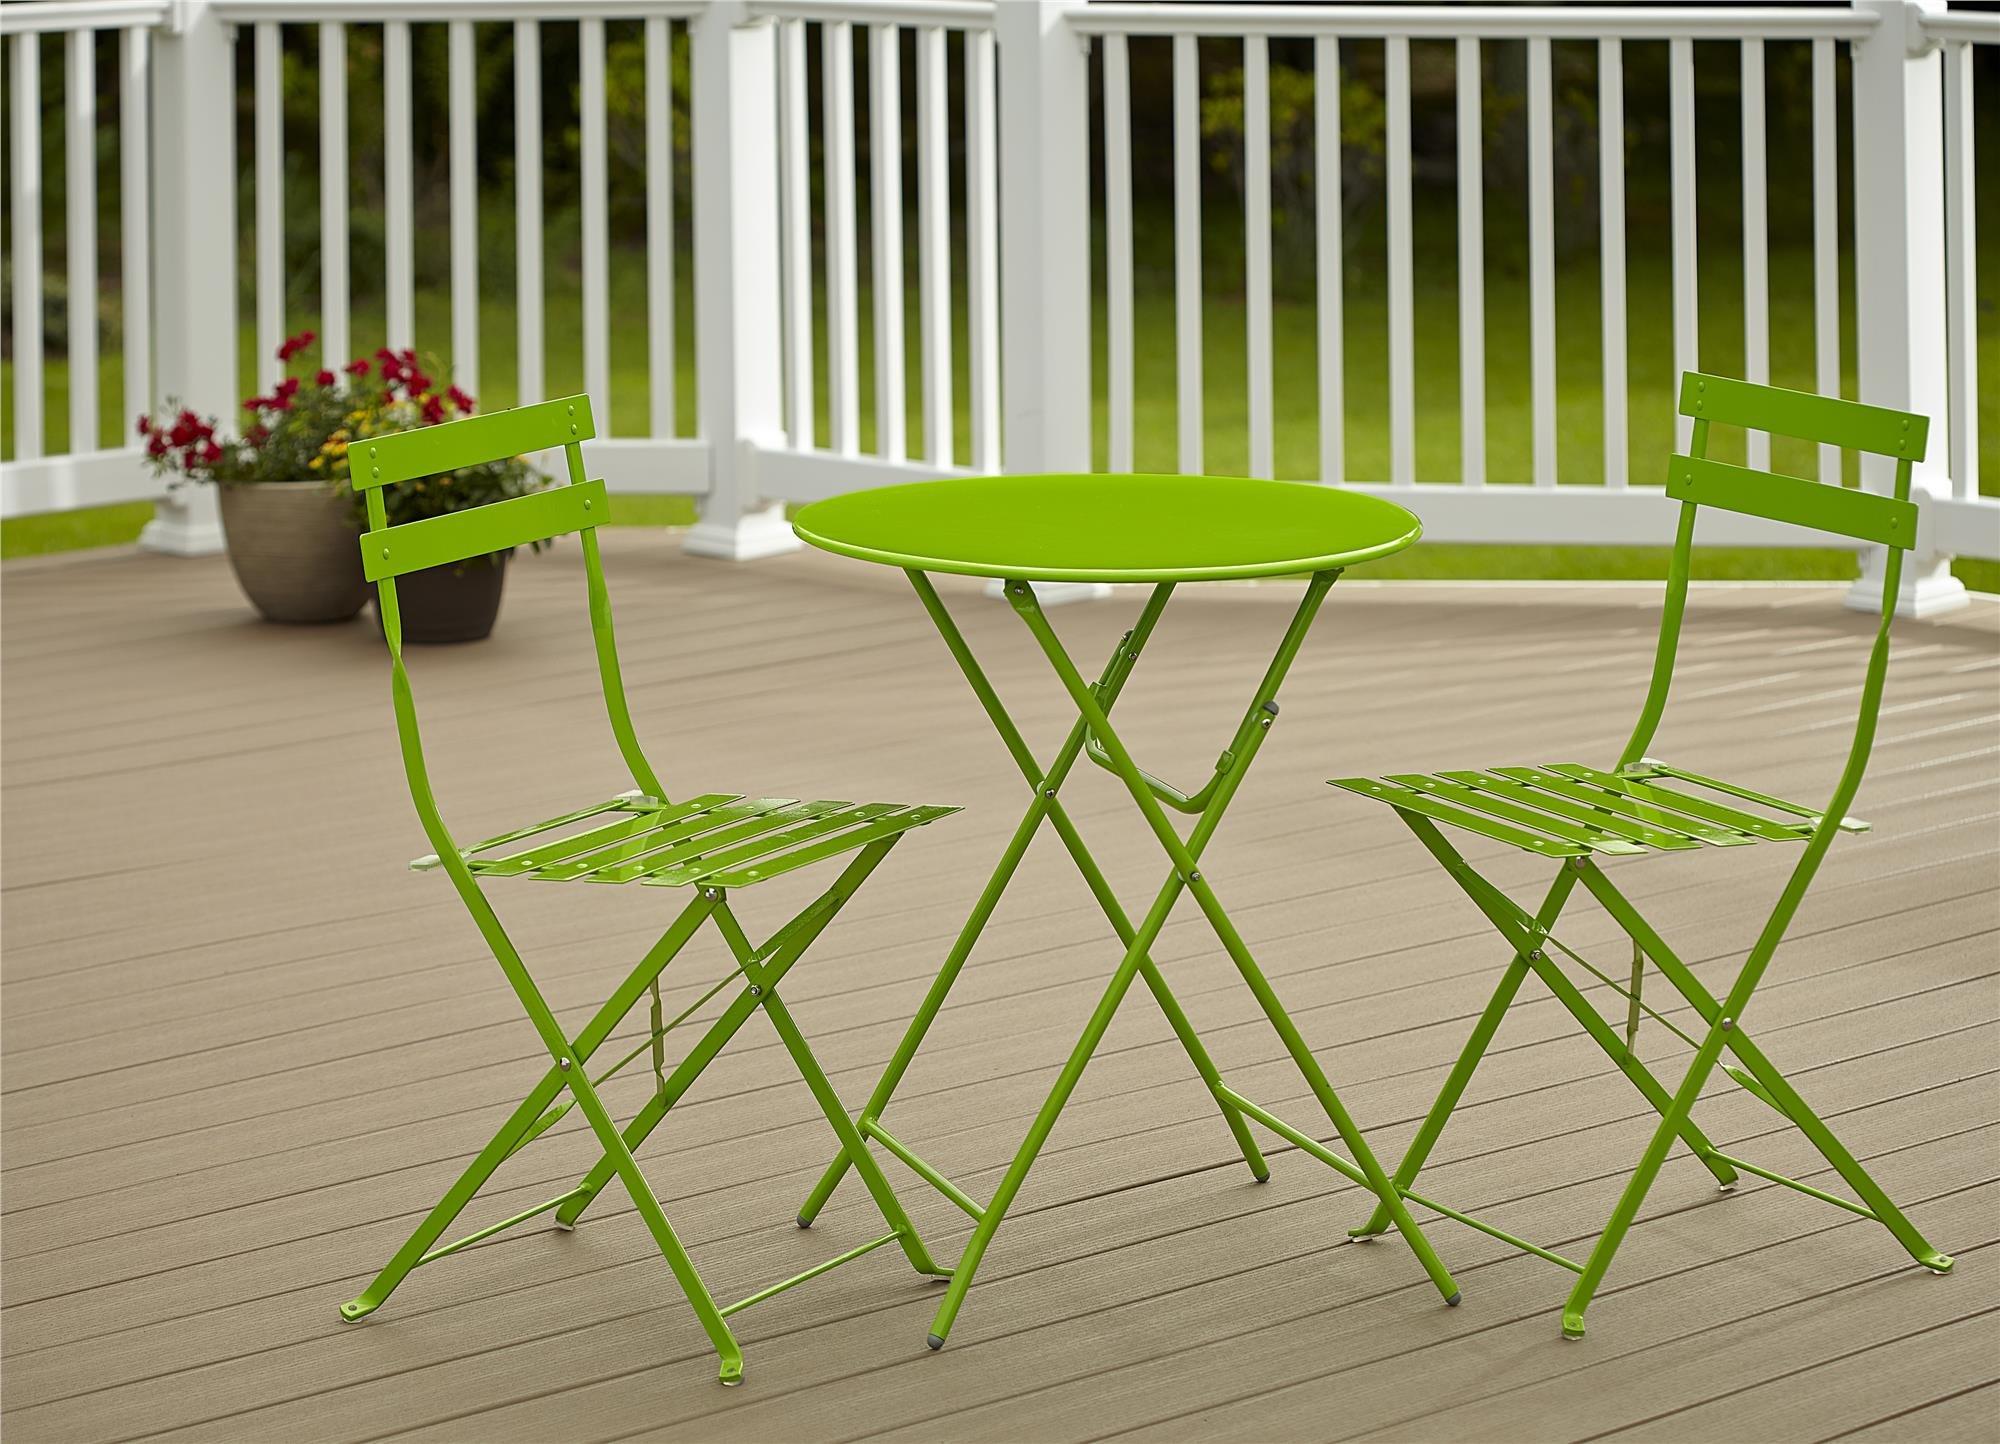 Cosco Outdoor Bistro Set, 3 Piece, Folding, Bright Green